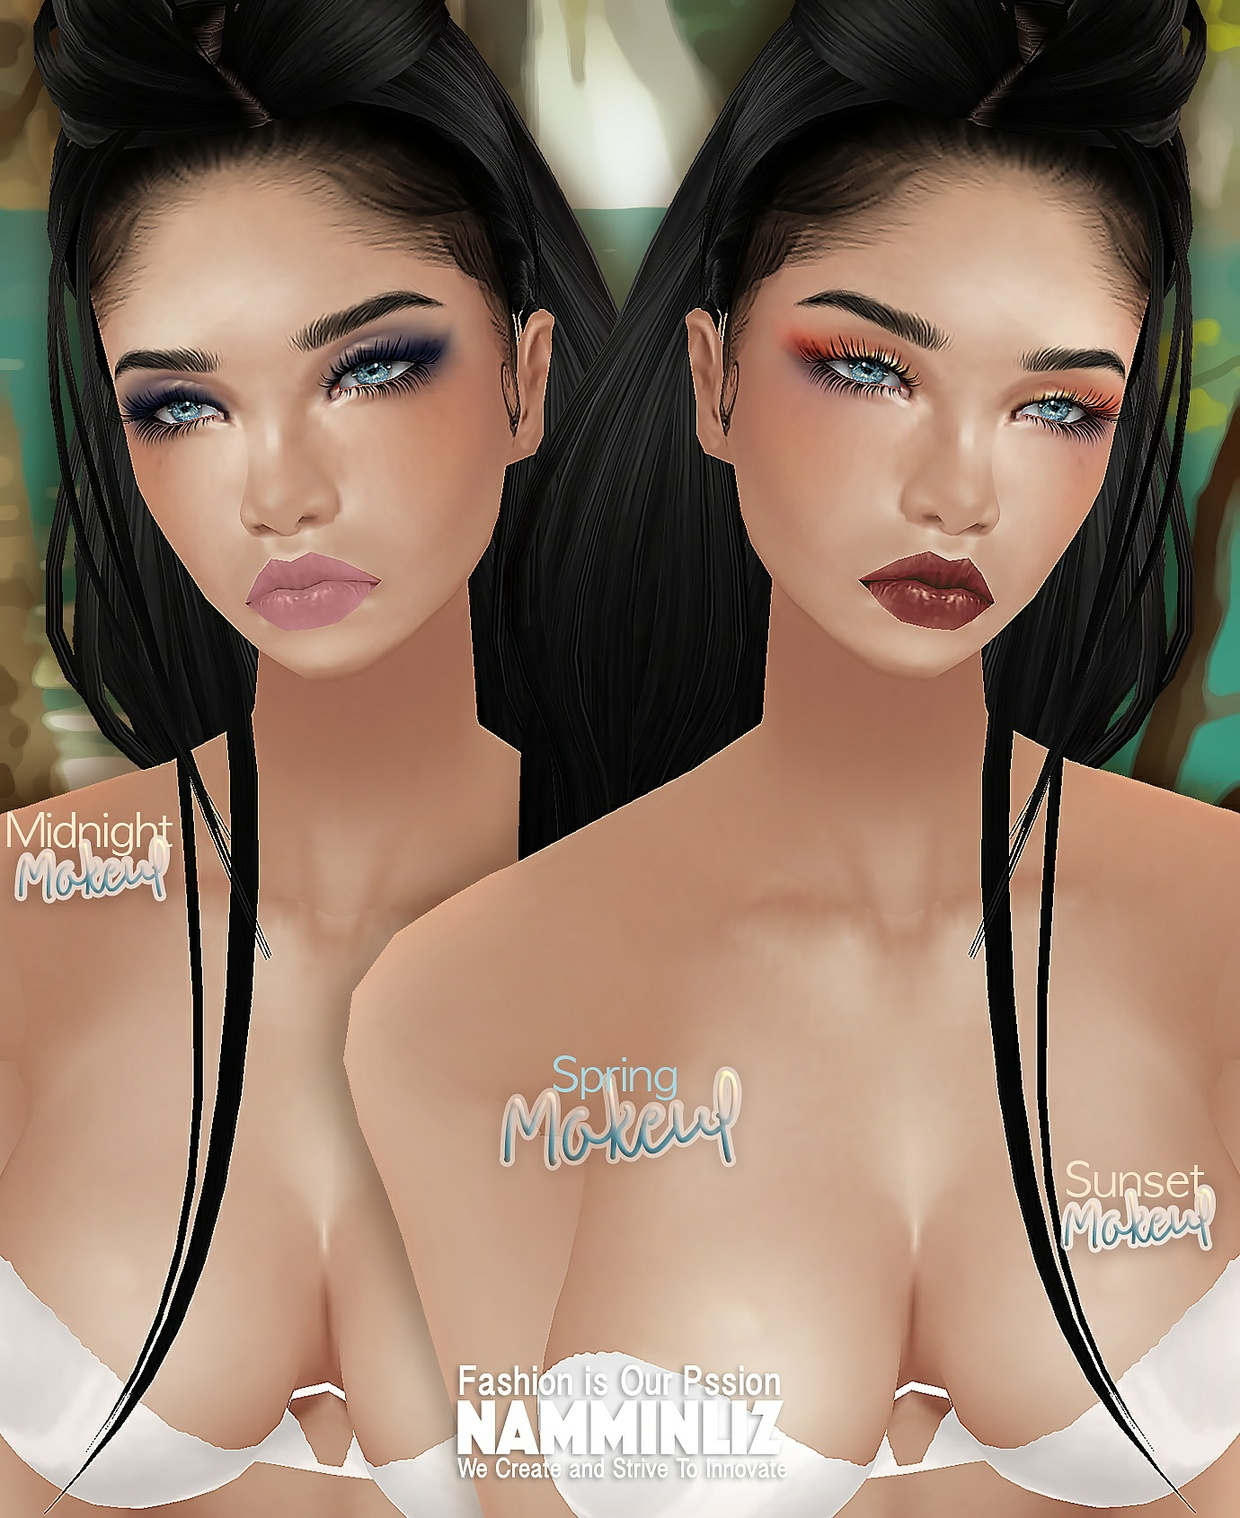 Spring 6 Eyes and Lips Make-up PSD + 1 Skin PNG